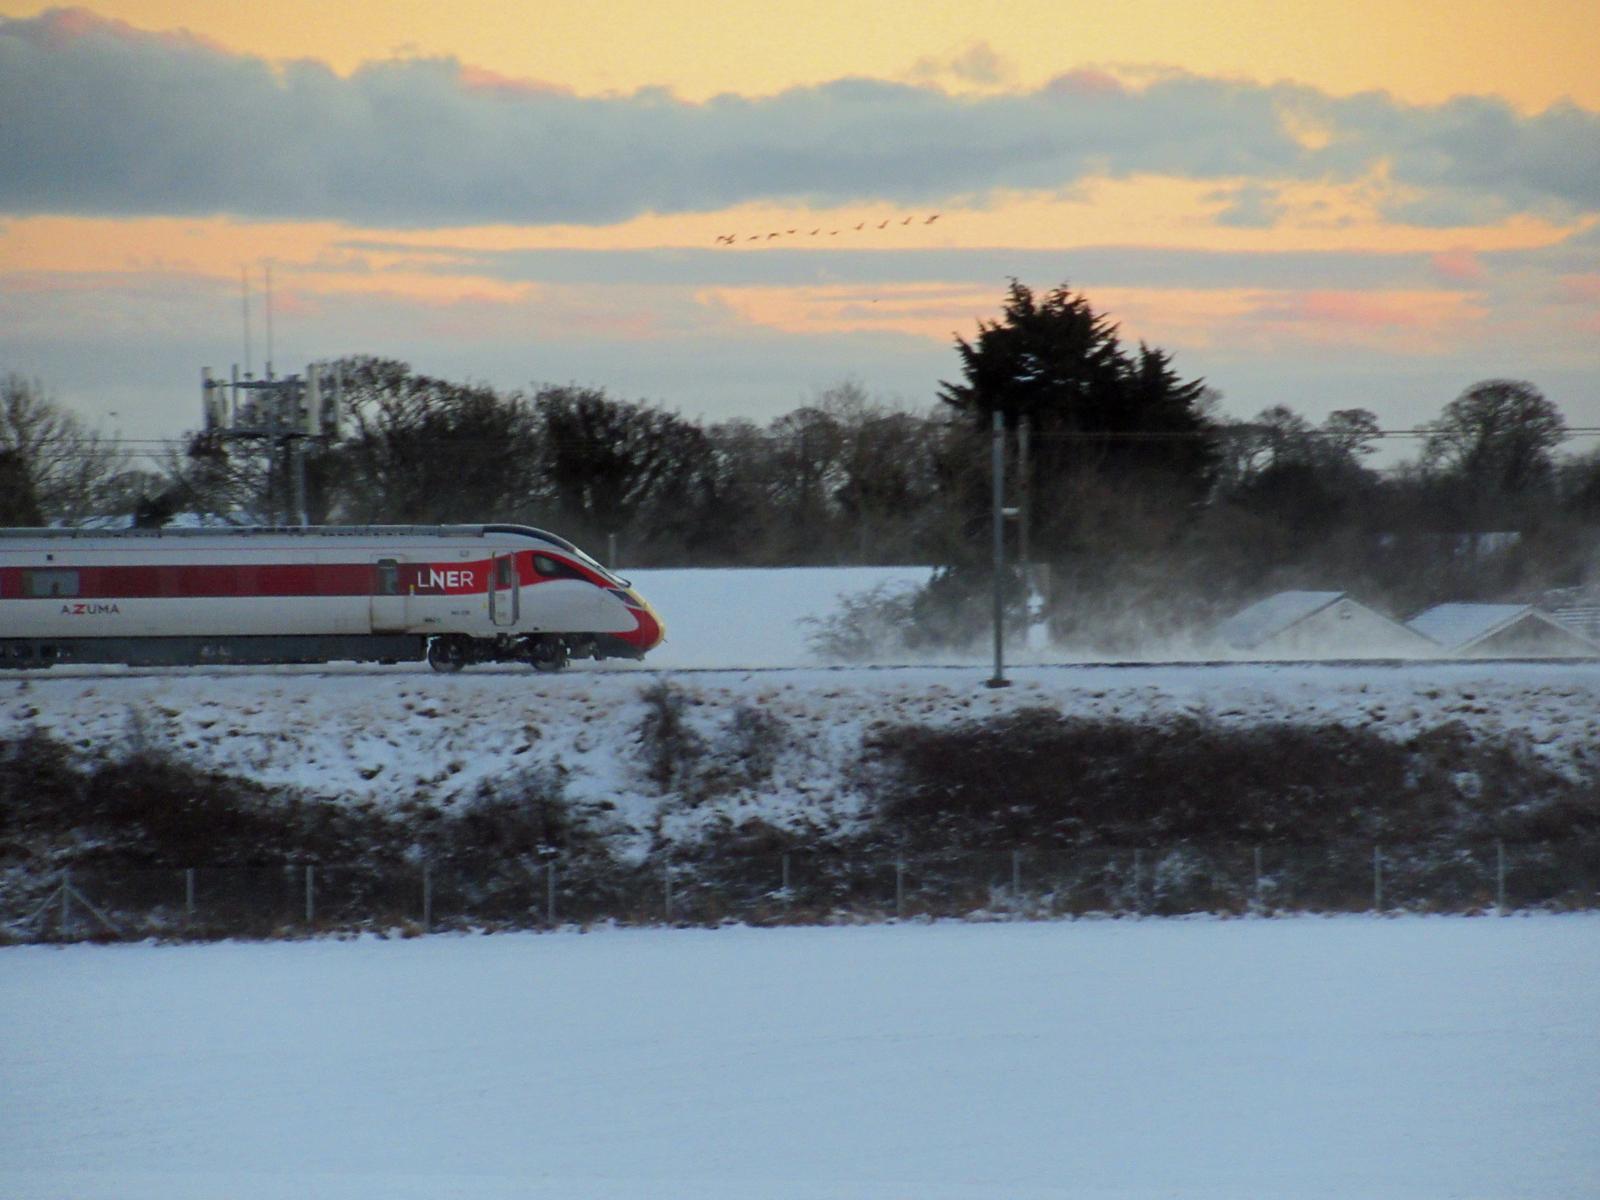 UK snow UK weather travel disruption